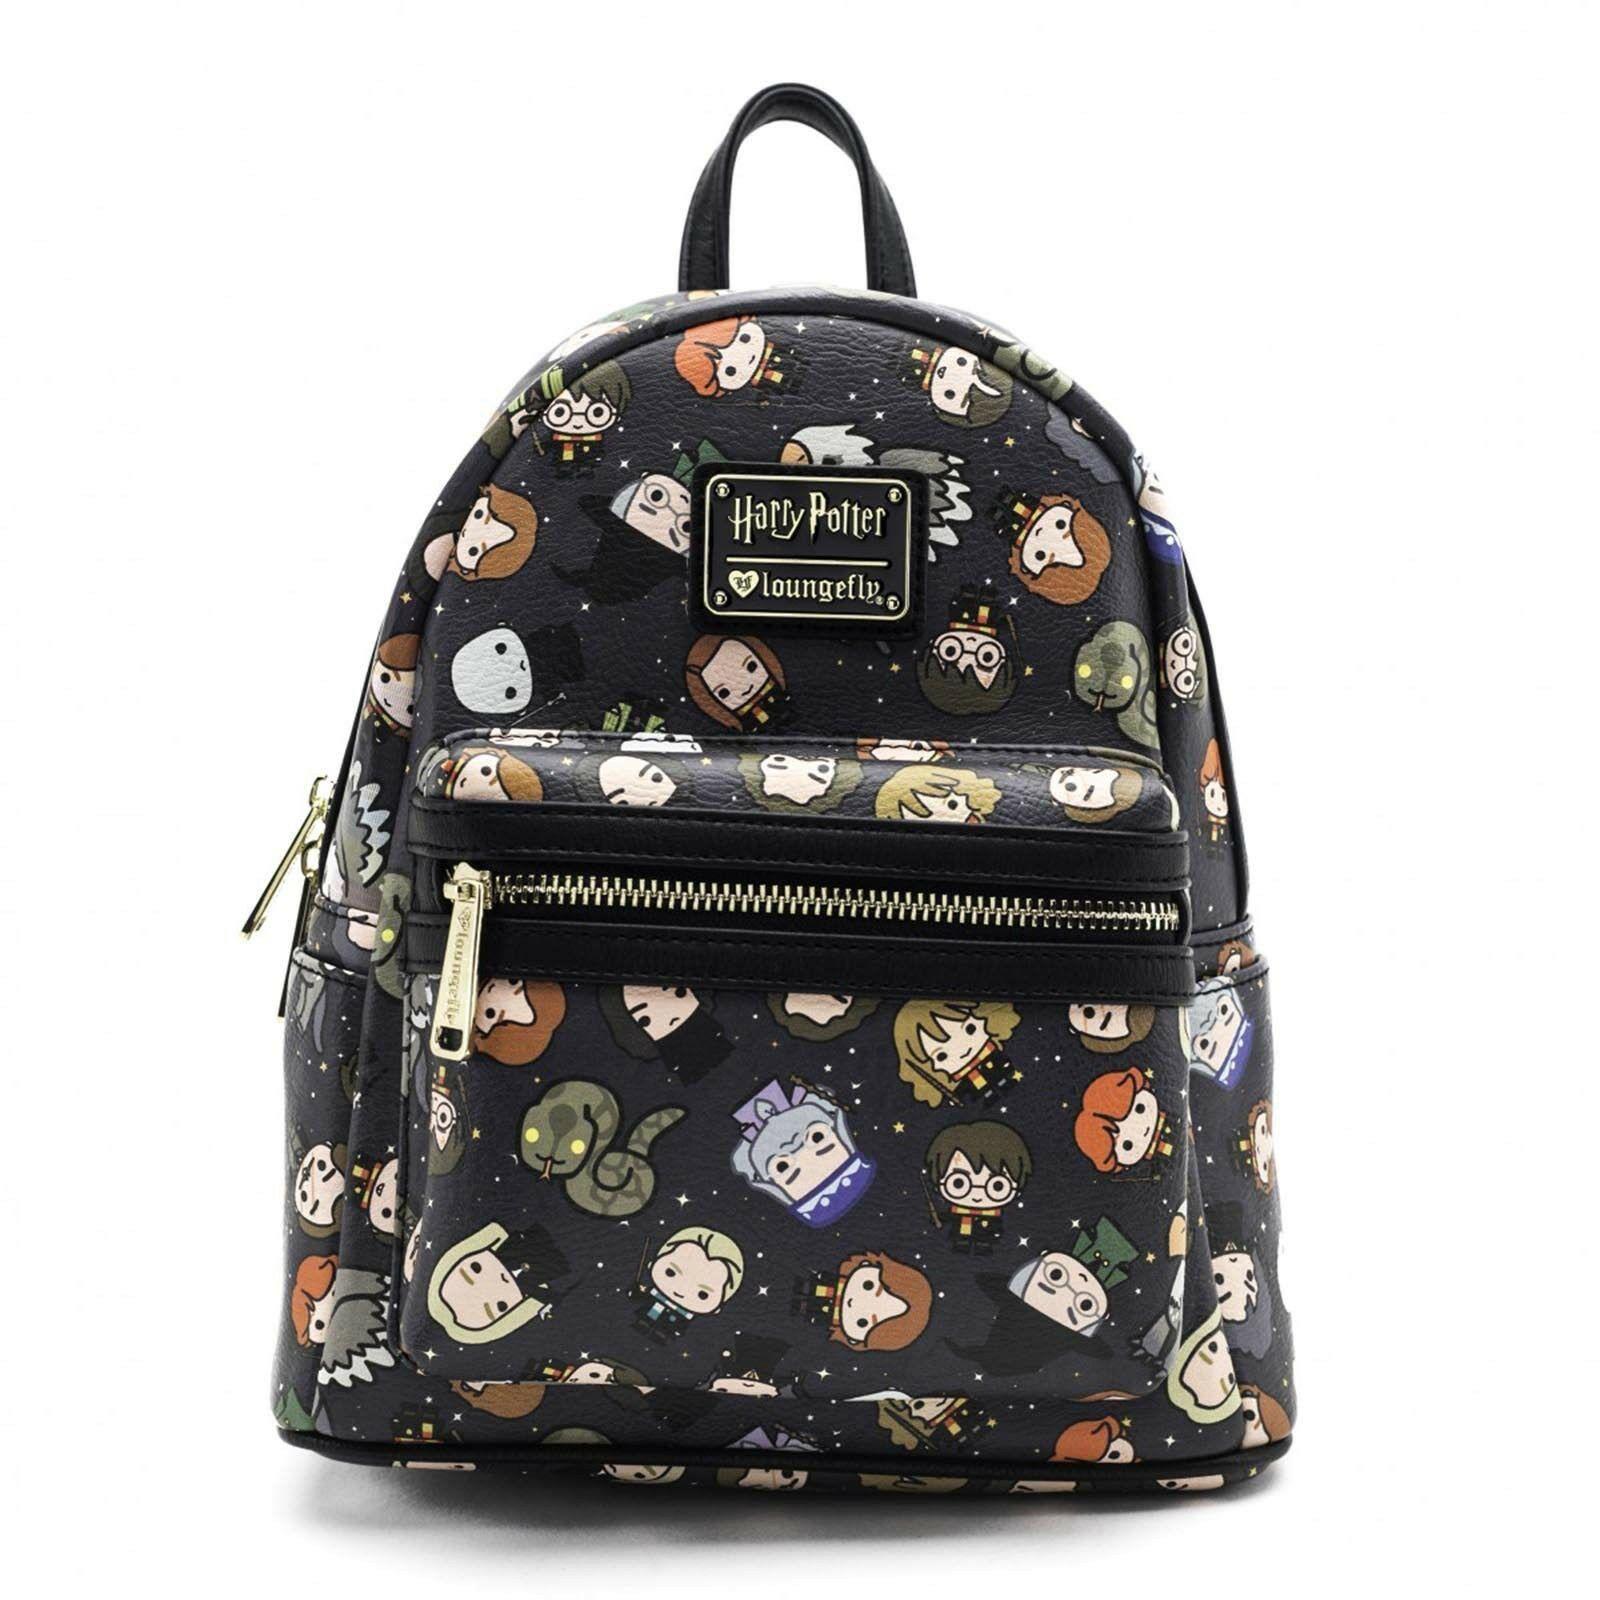 Loungefly  Harry Potter - Chibi Print Mini-Backpack image ... 375fc5642da57